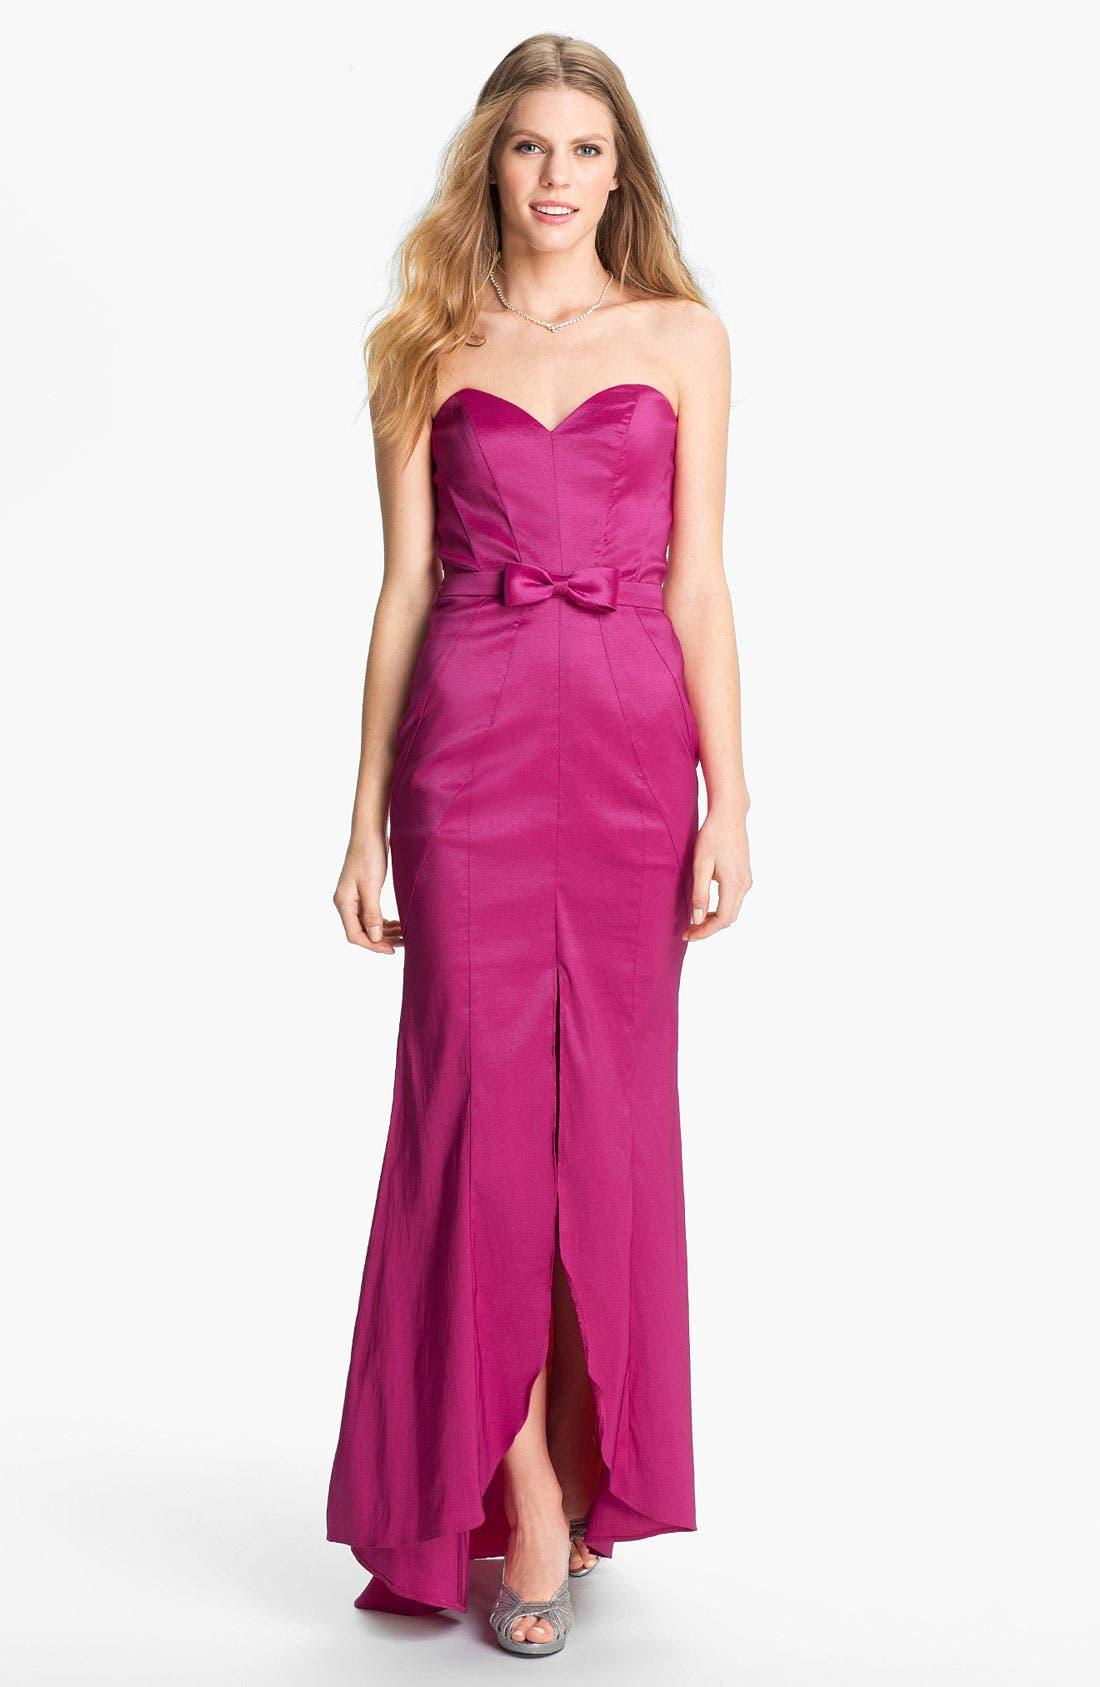 Alternate Image 1 Selected - Jessica McClintock Seamed Strapless Taffeta Gown